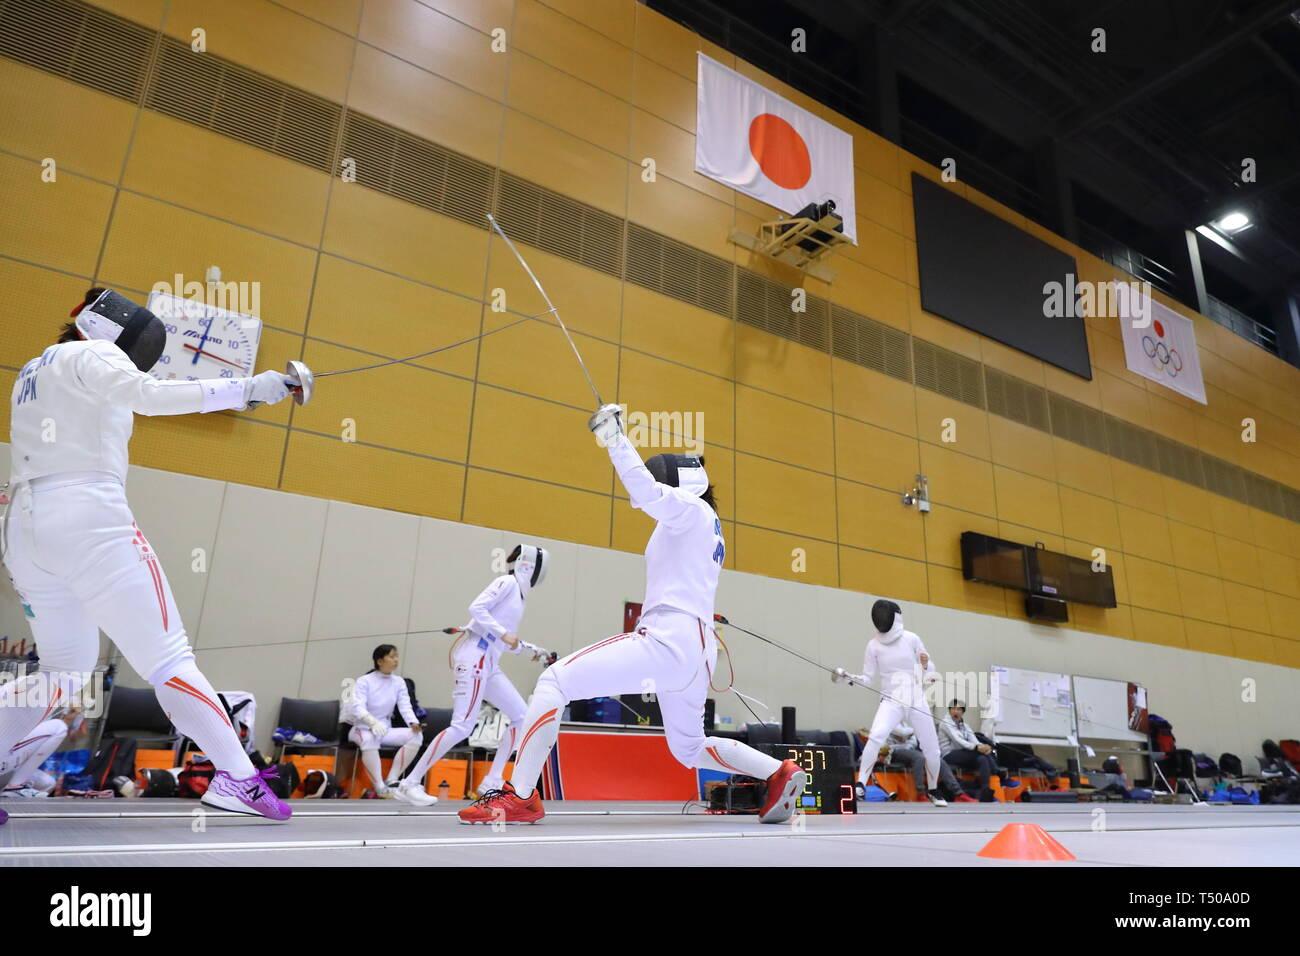 Ajinomoto National Training Center, Tokyo, Japan. 19th Apr, 2019. General view, APRIL 19, 2019 - Fencing : Japan National Team Training Session at Ajinomoto National Training Center, Tokyo, Japan. Credit: Naoki Nishimura/AFLO SPORT/Alamy Live News Stock Photo